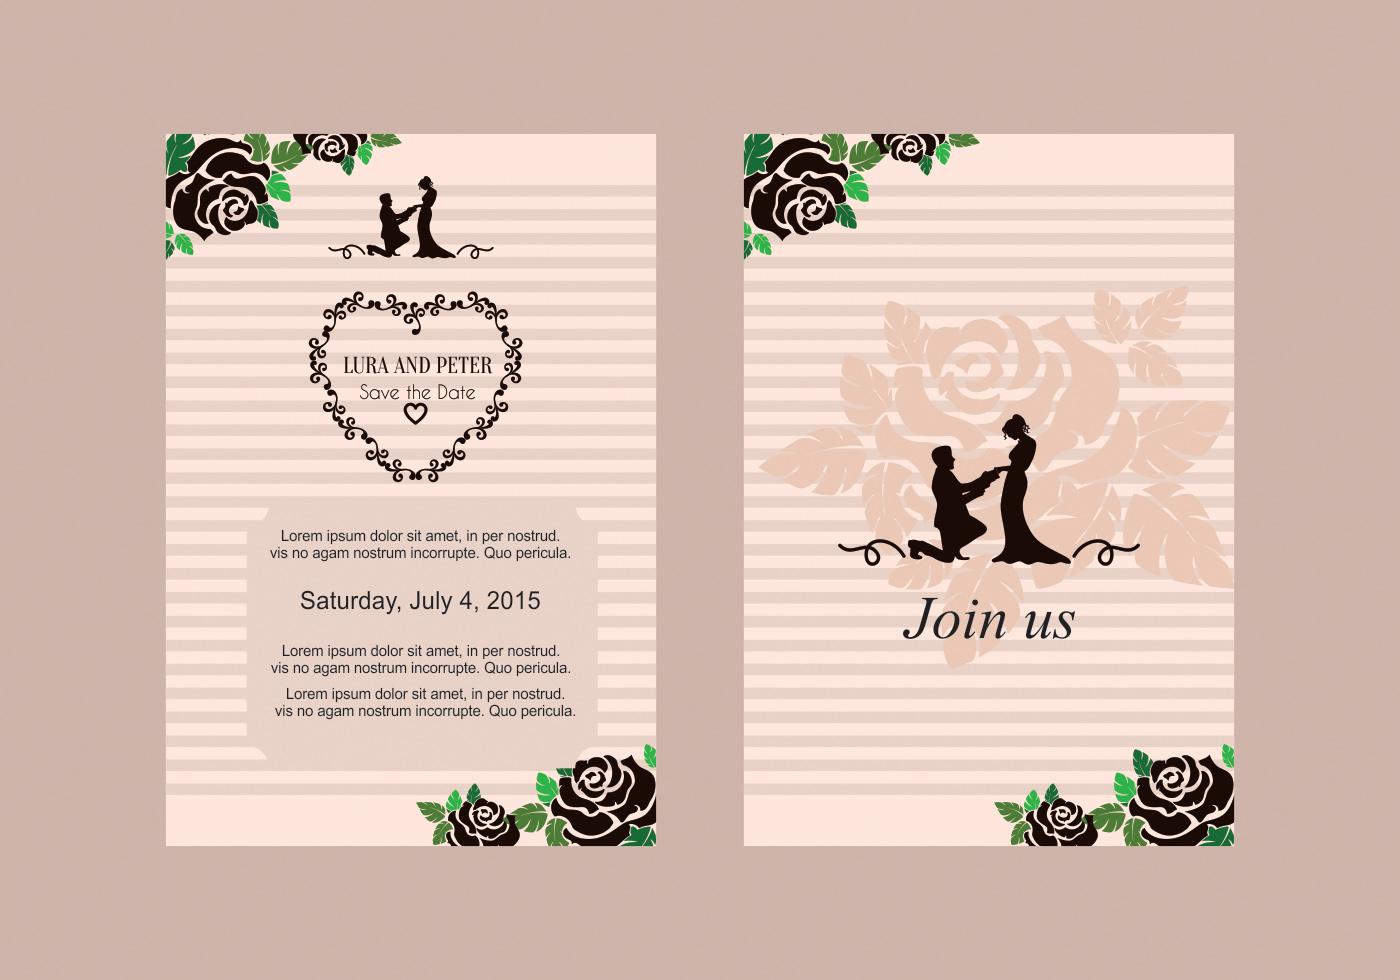 Rose invitation free vector art 7756 free downloads stopboris Images